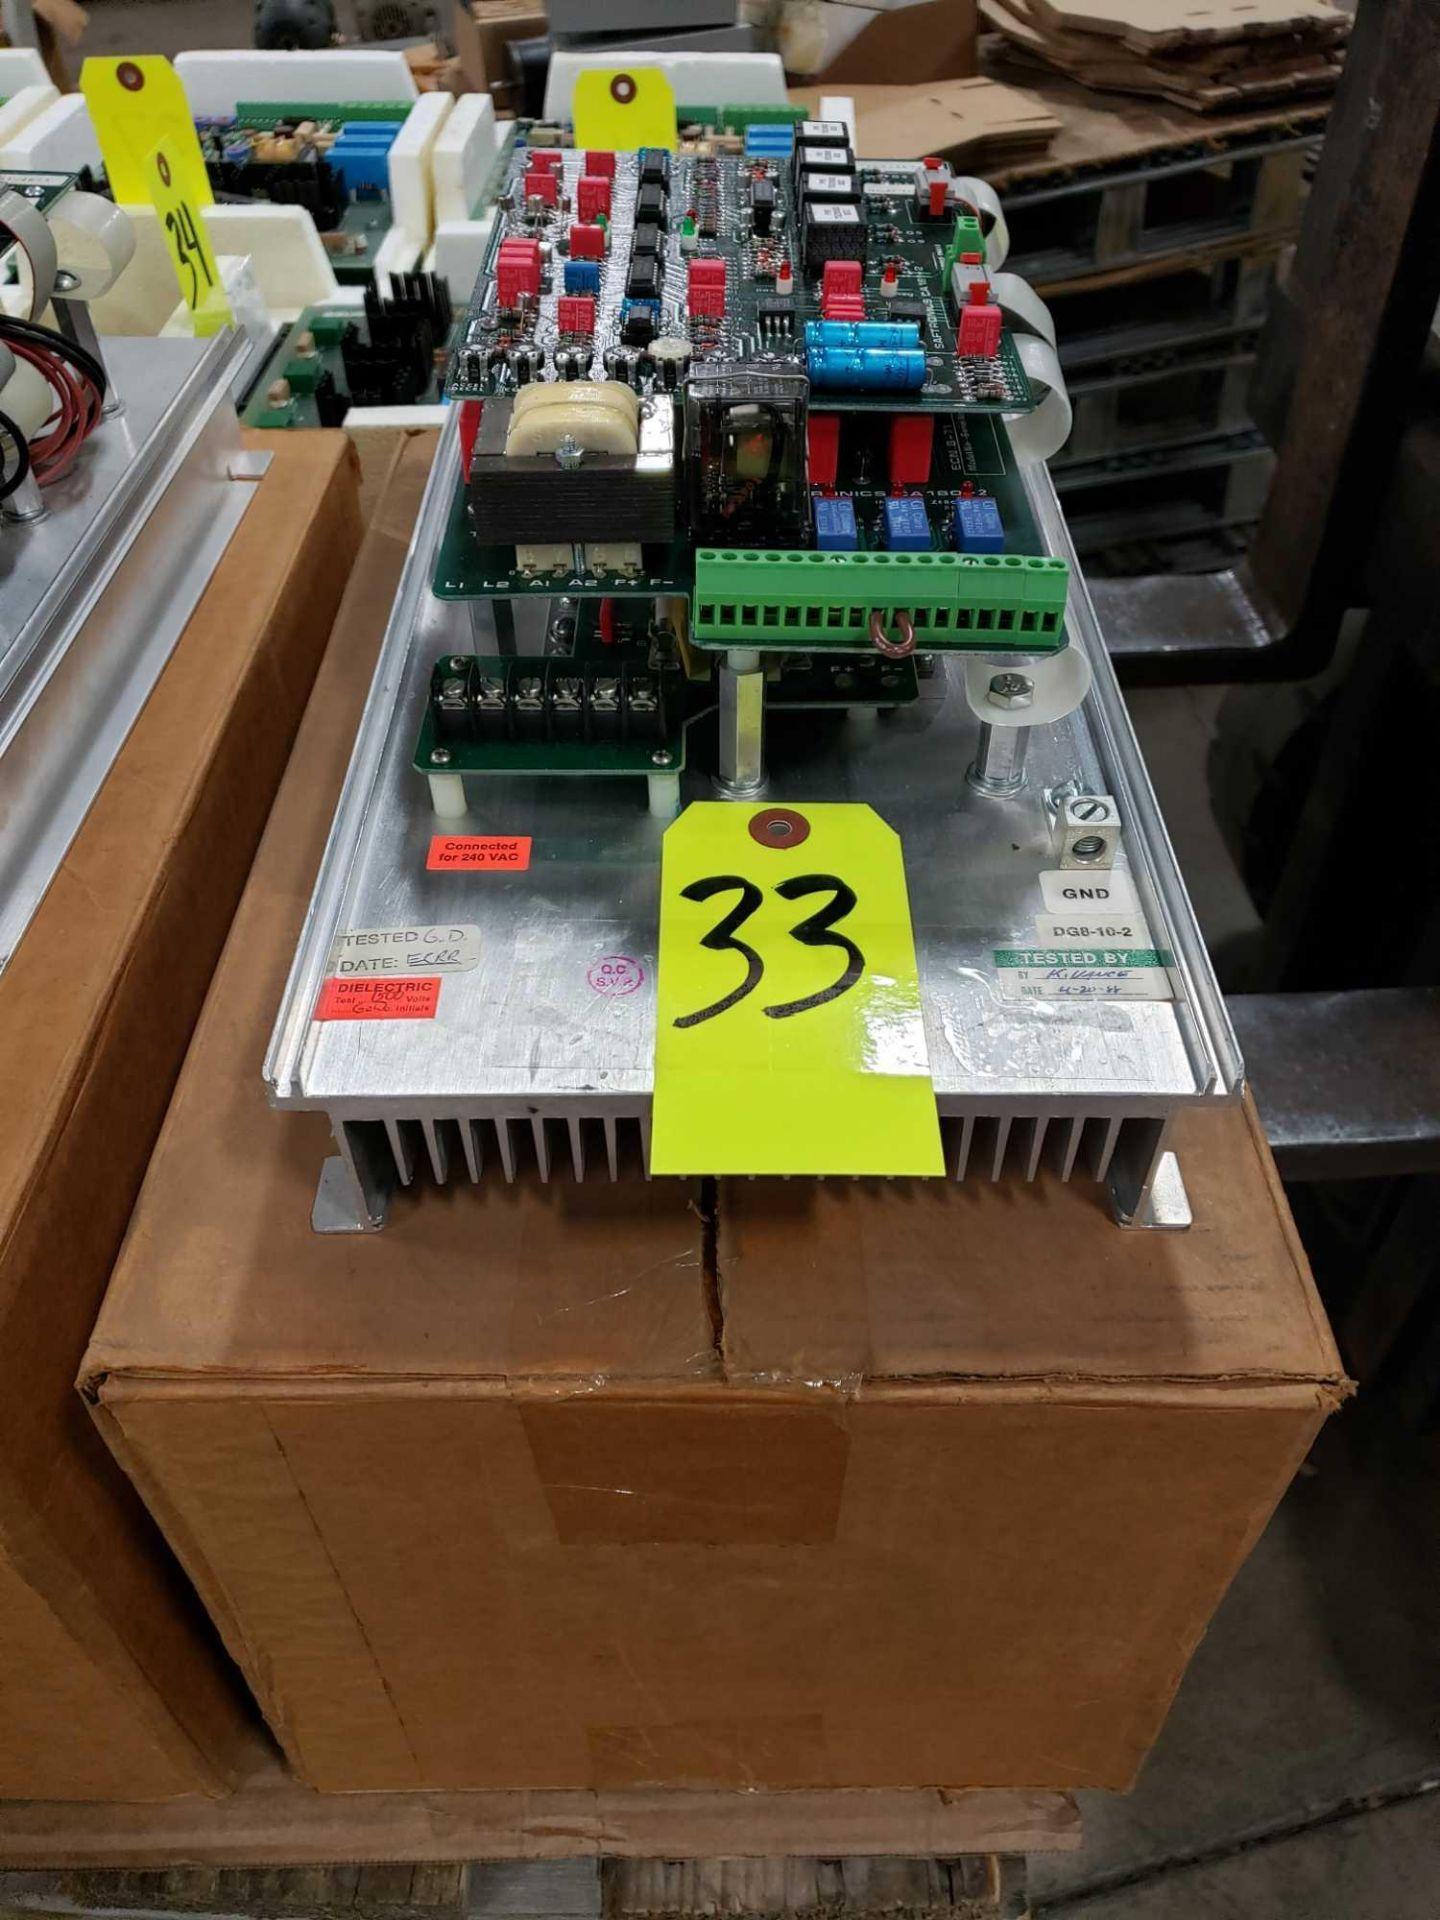 Lot 33 - Saftronics 2hp drive model DG8-10-2. New in box.